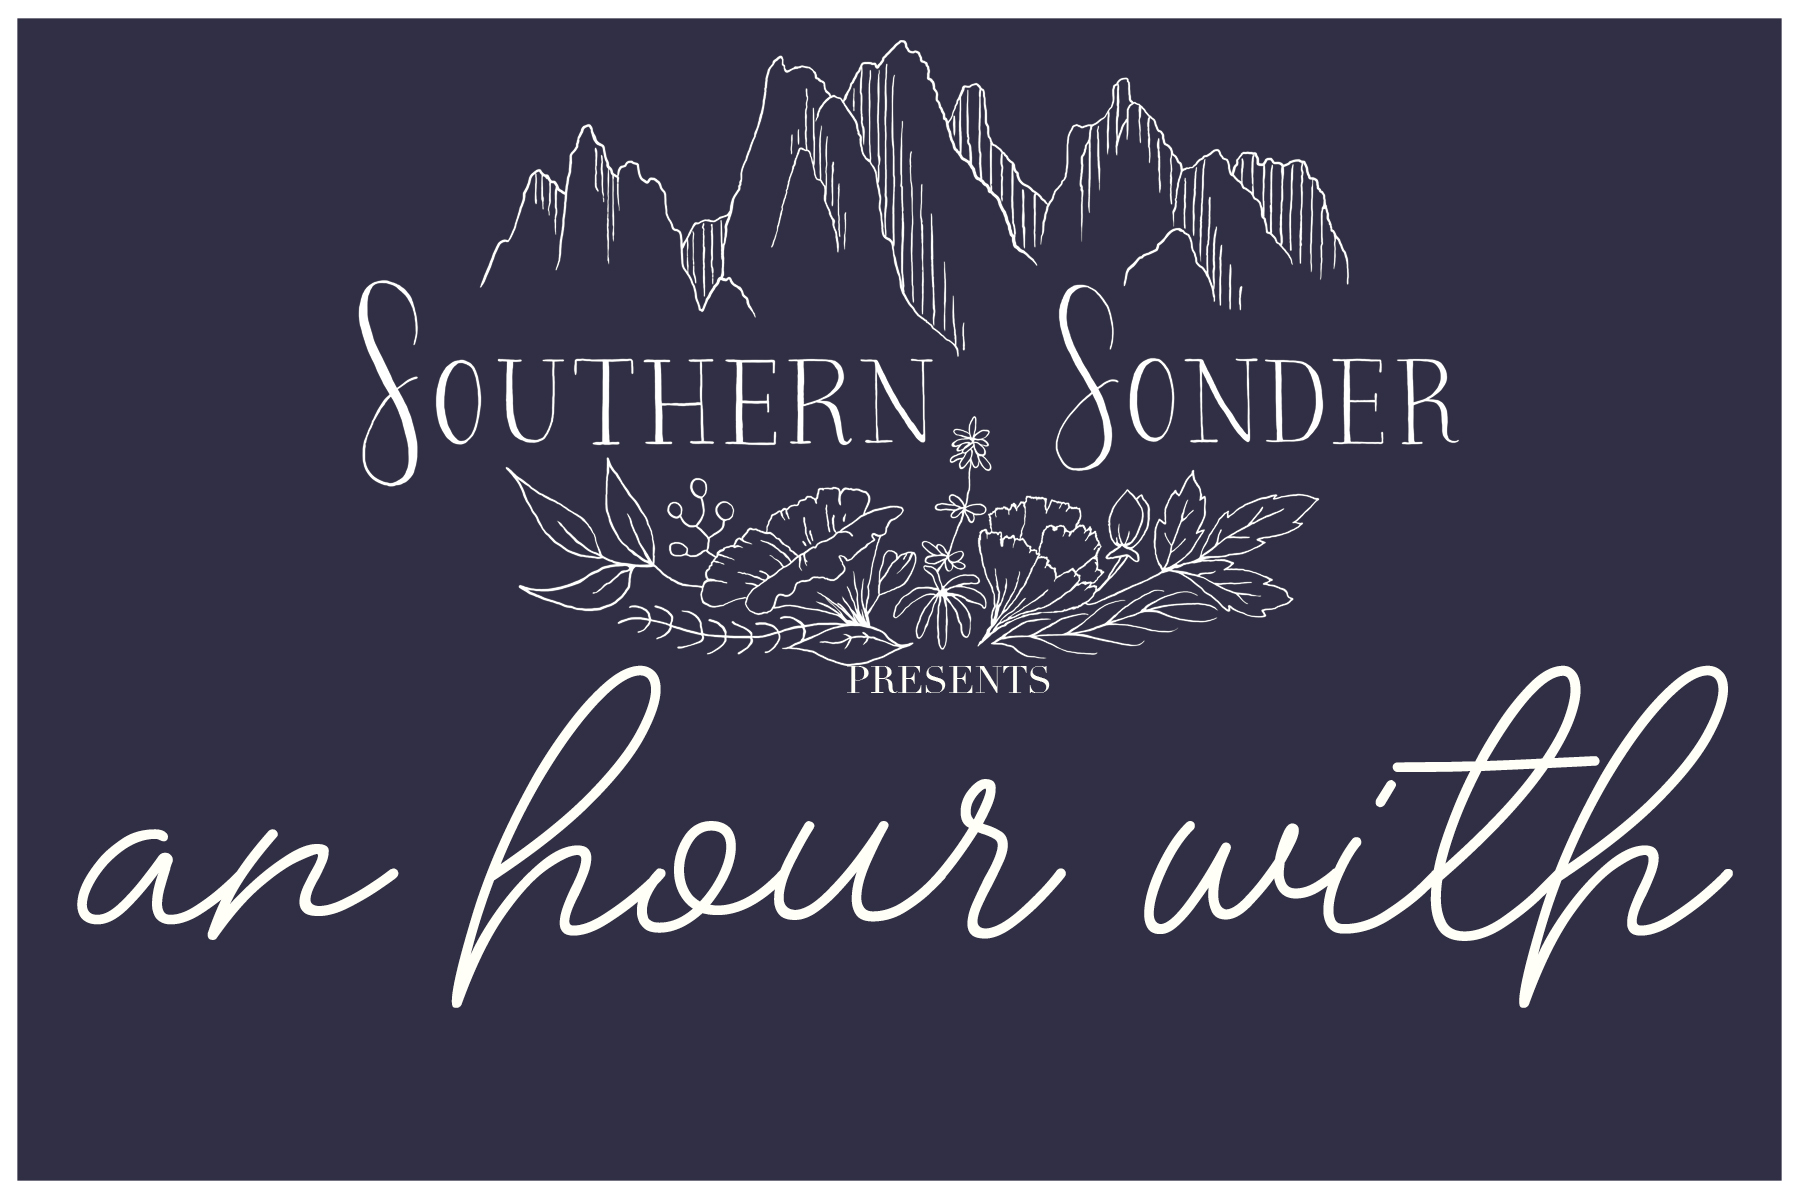 southernsonderahw.jpg